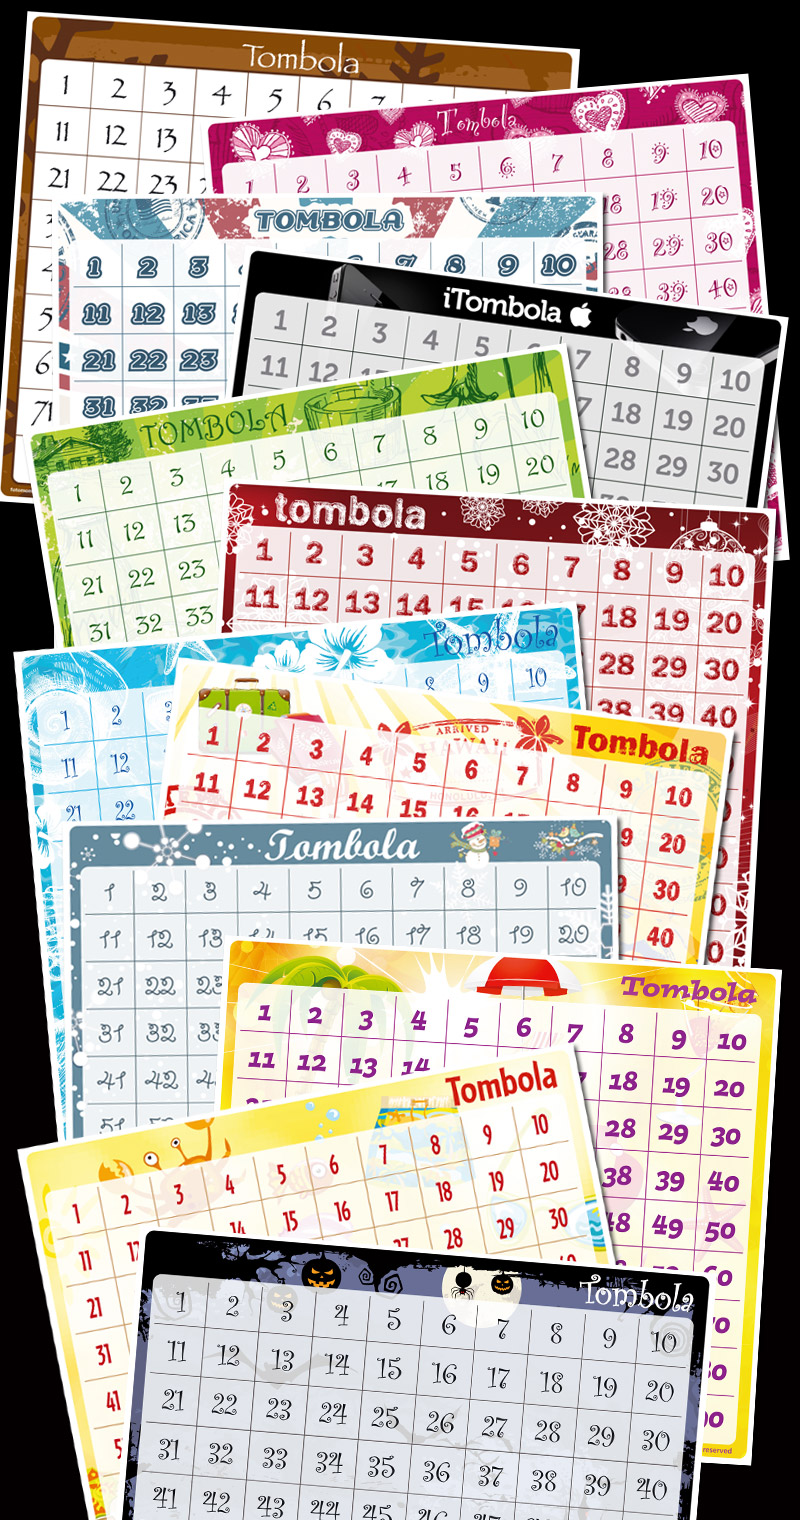 Insieme tabelloni 2011